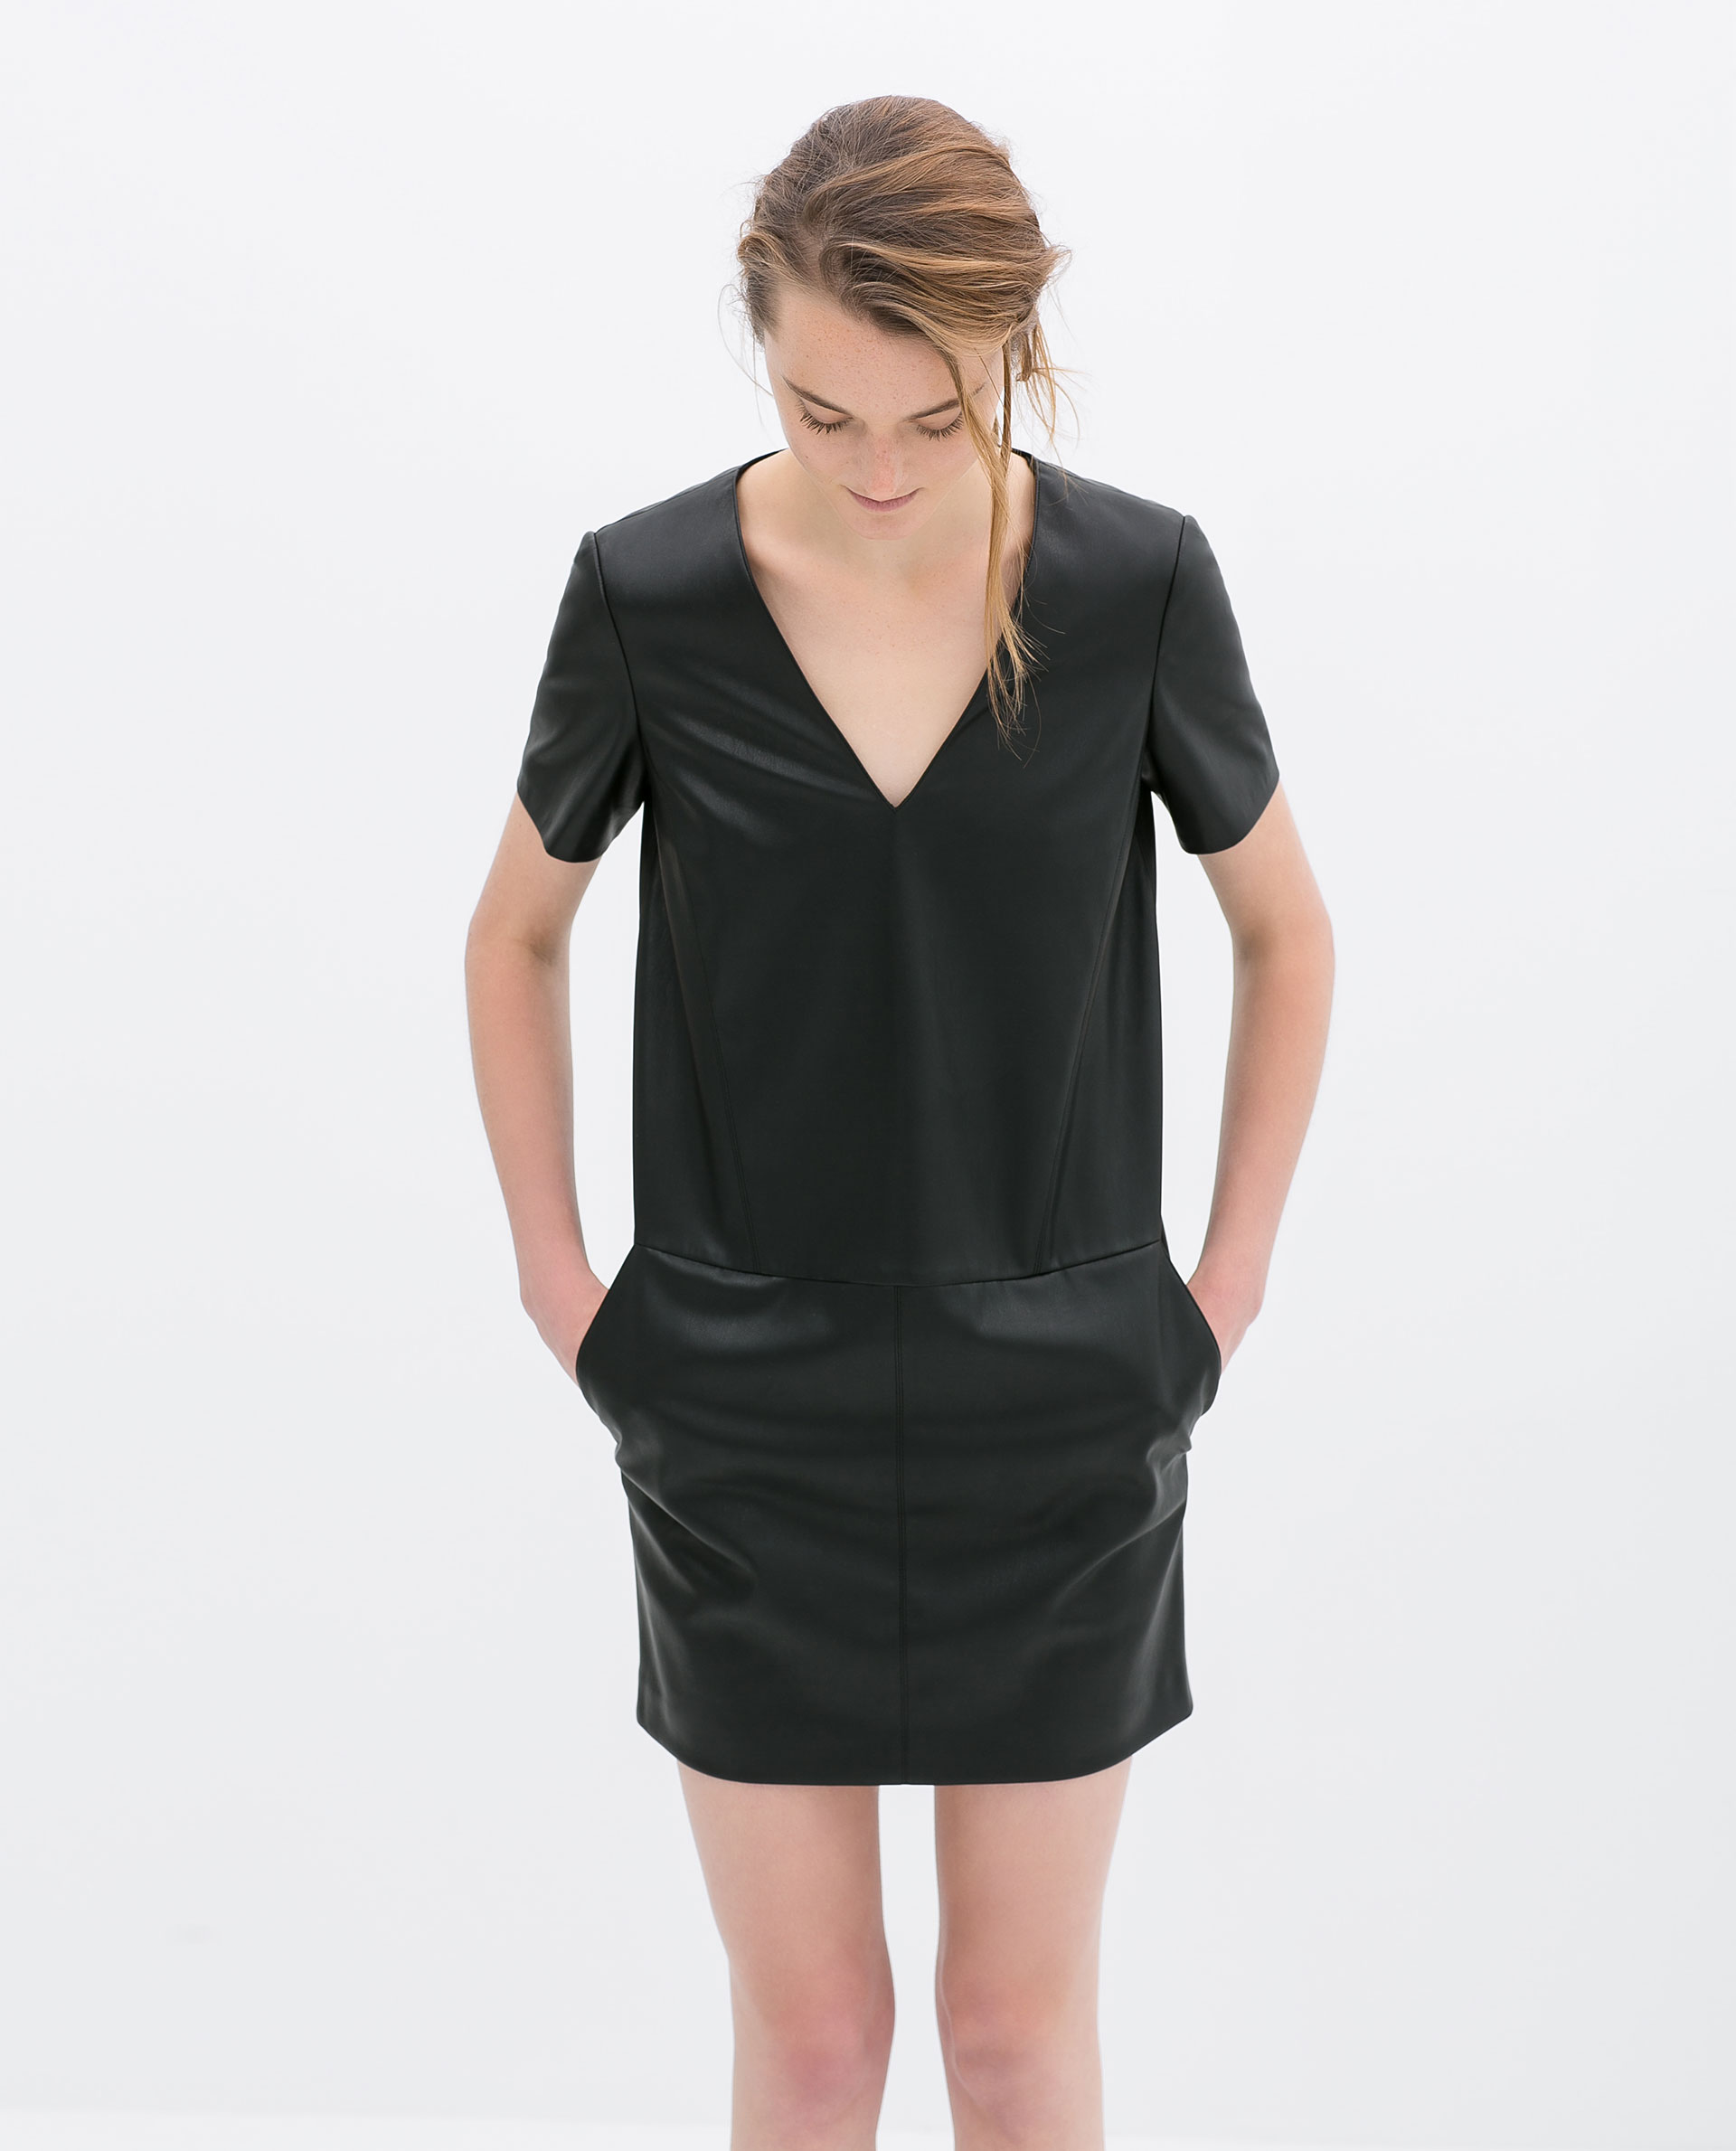 Zara-Look-5